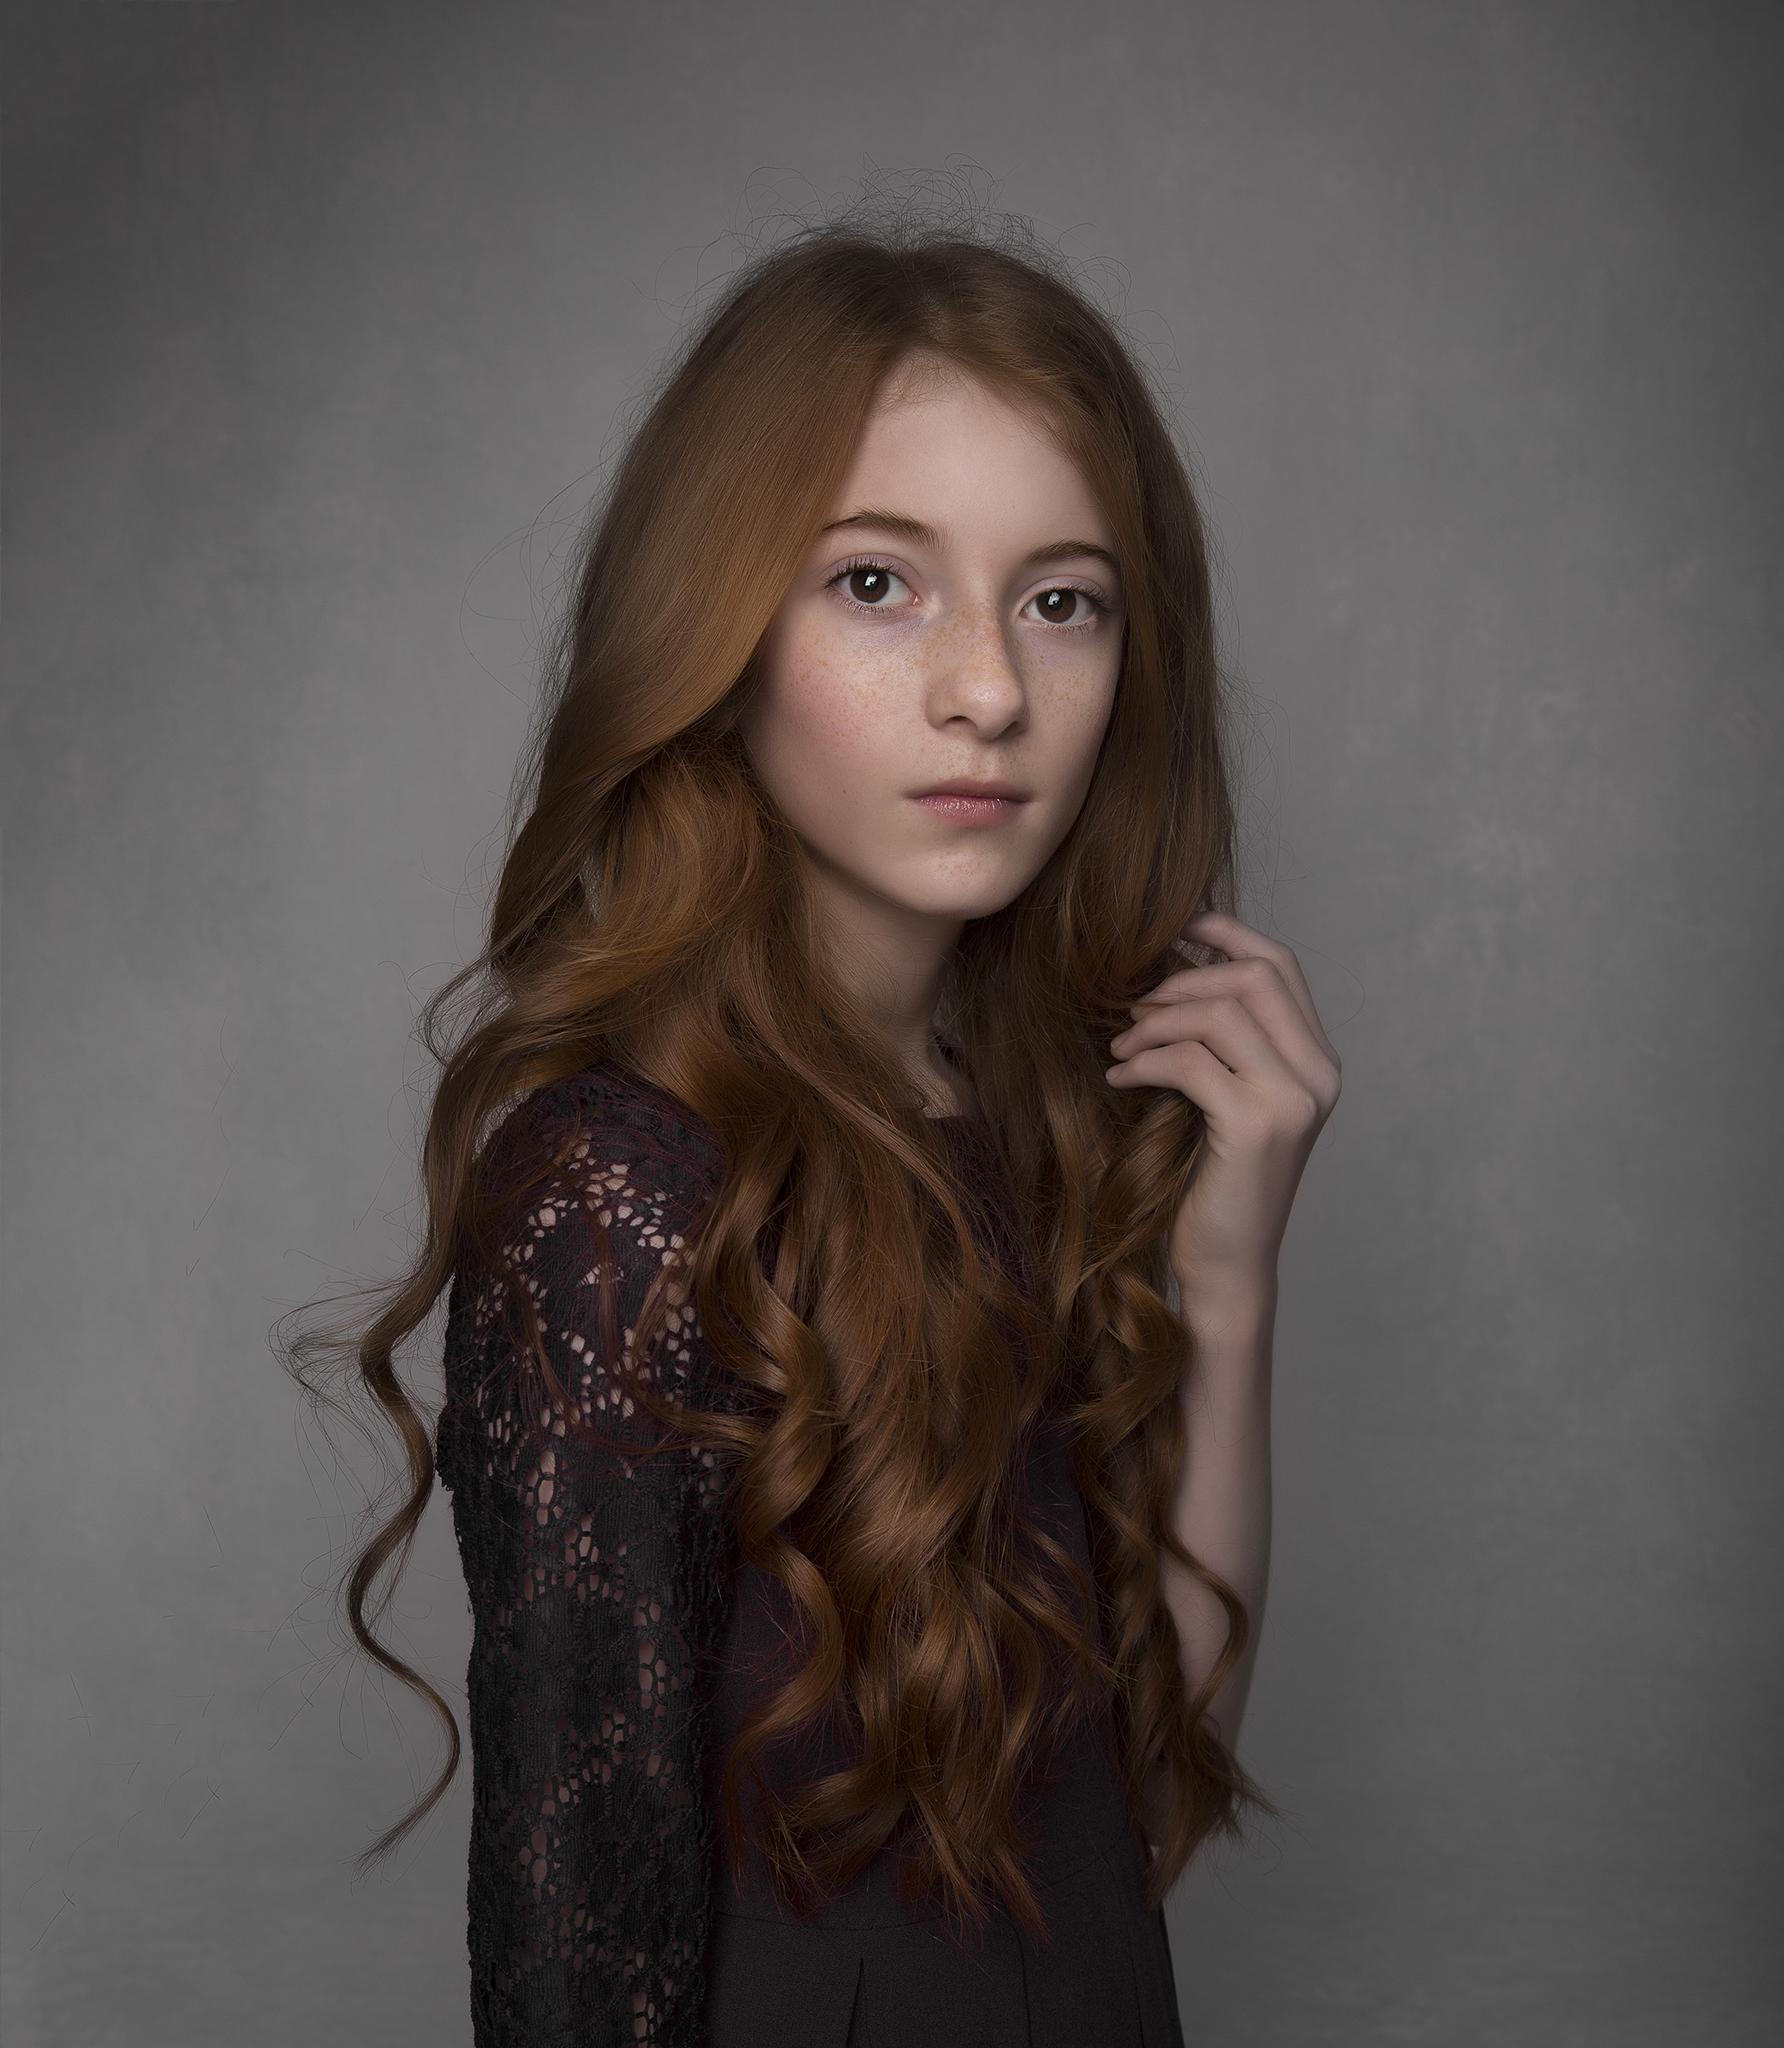 elizabethgphotography_childrens_fineart_kingslangley_hertfordshire_model_actor_updates_leah_barnes_kids_london_5a.jpg